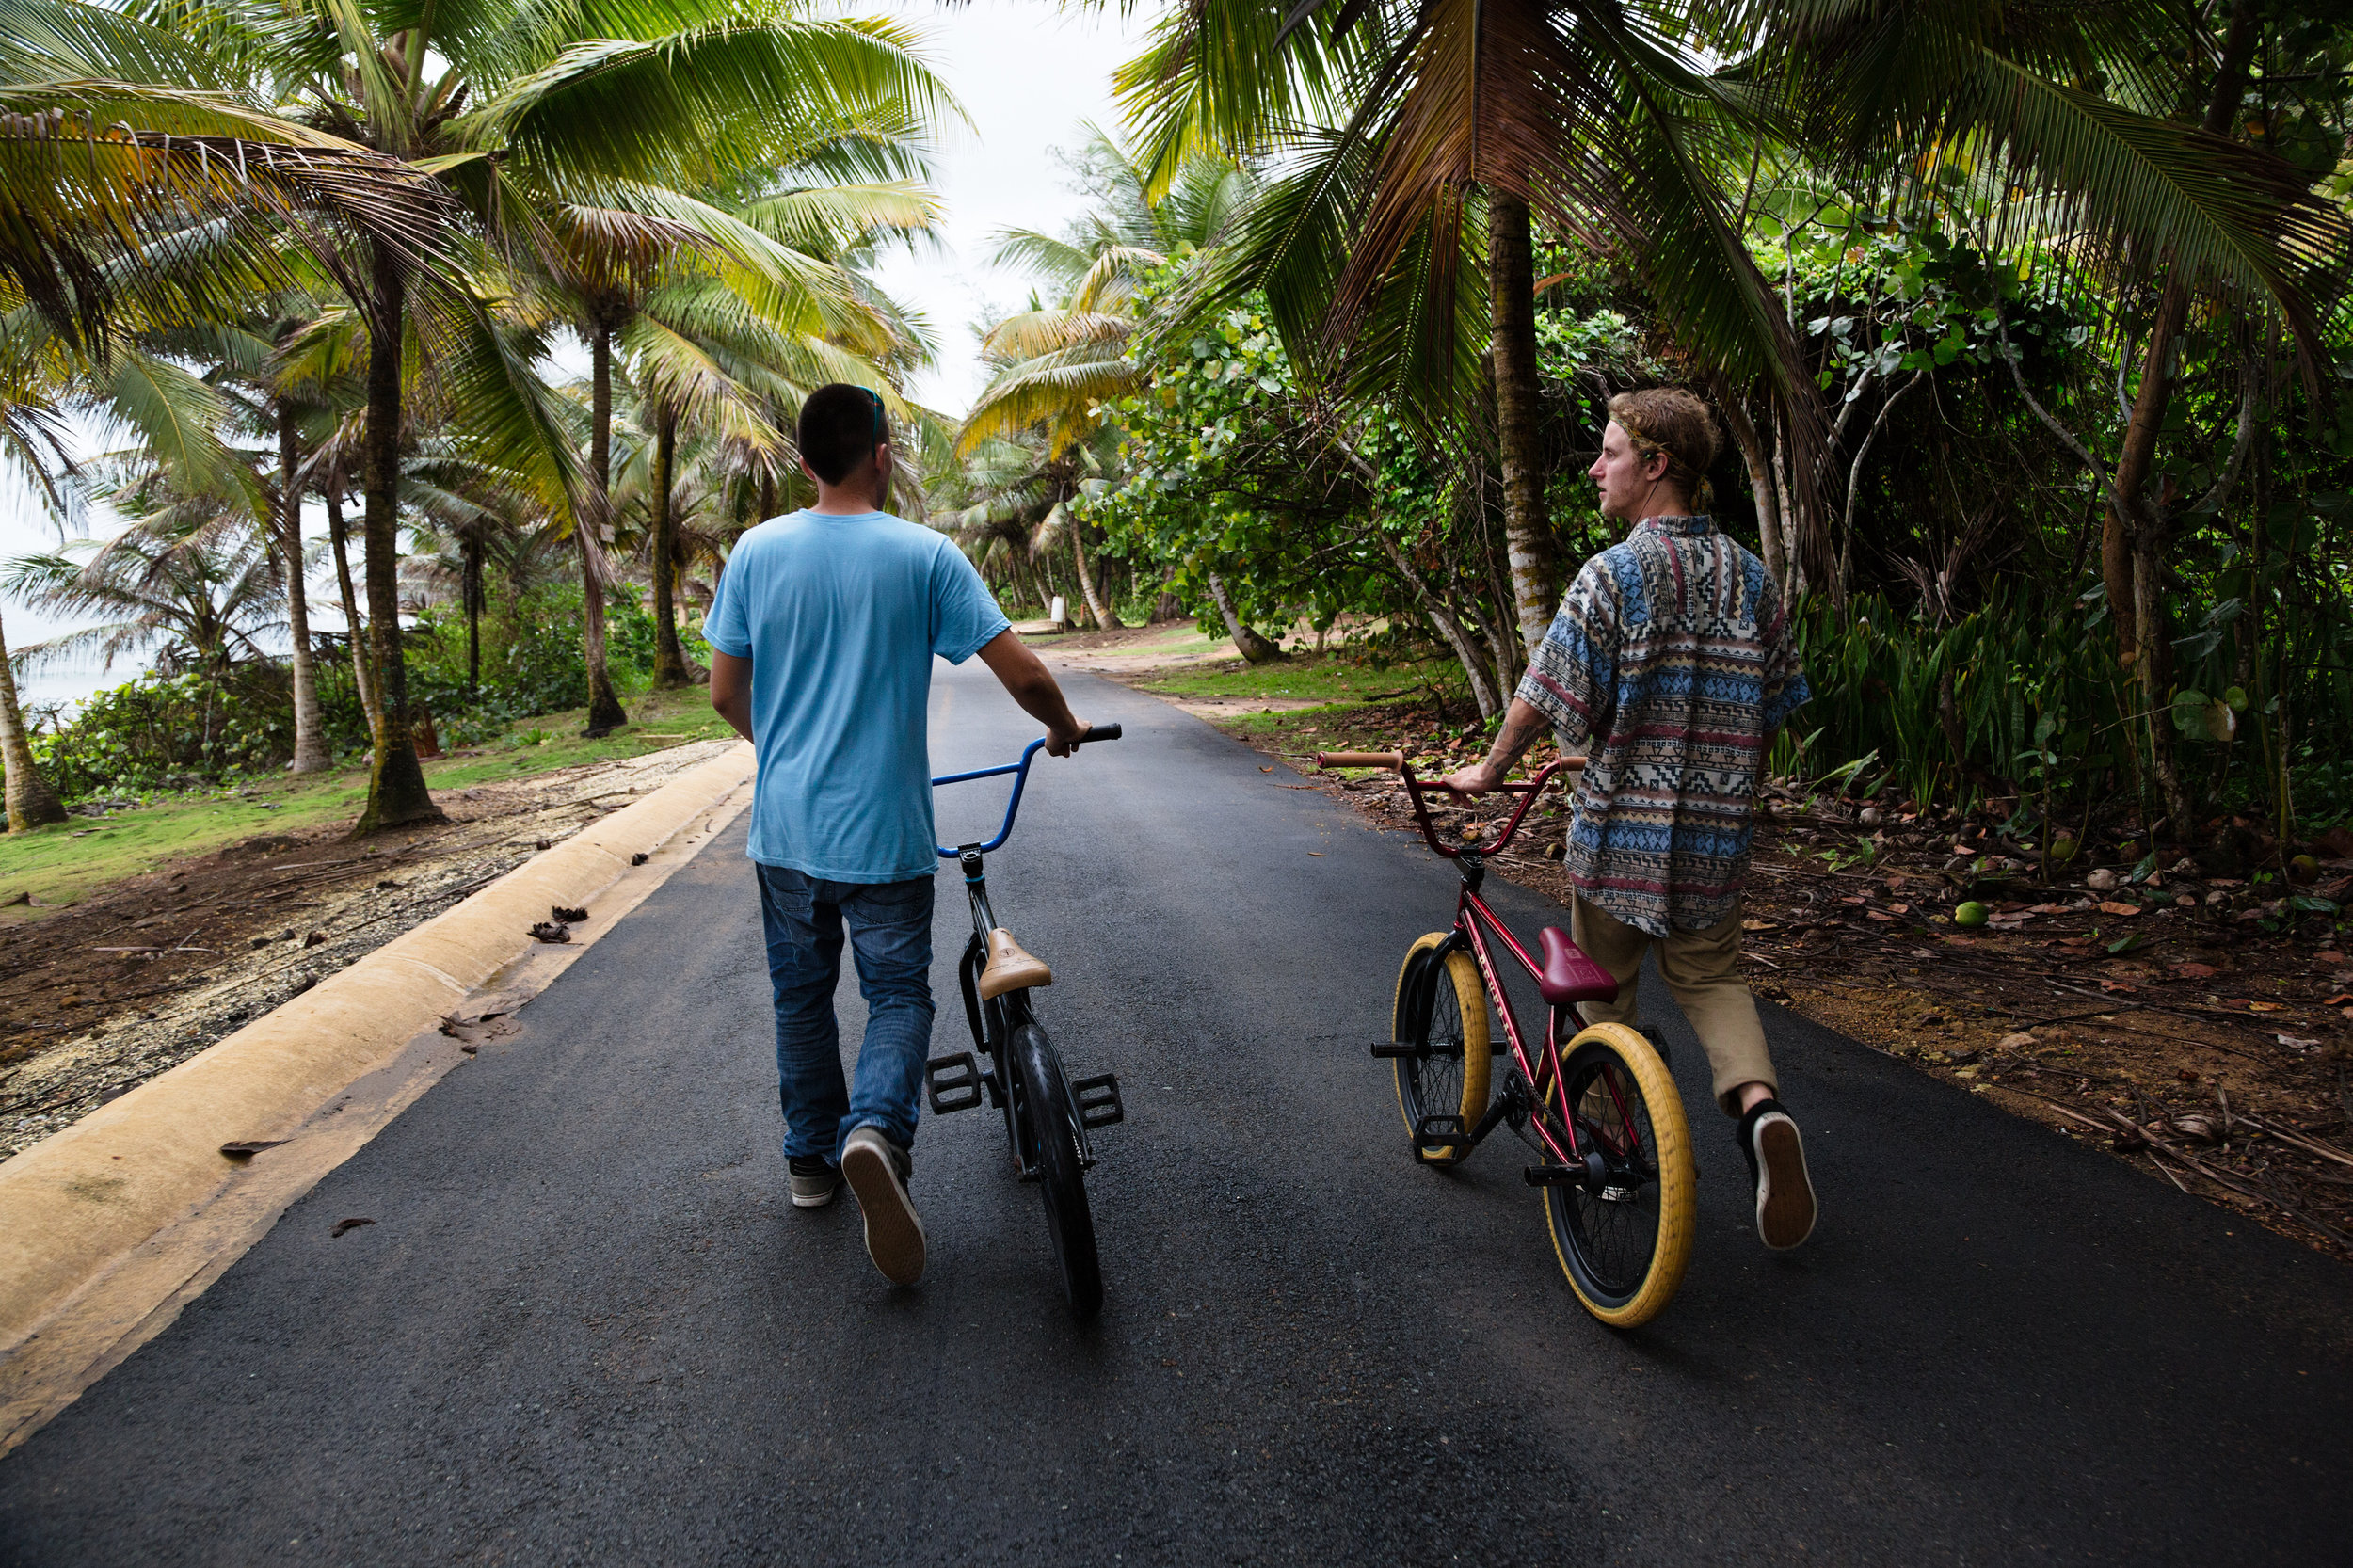 Puerto-Rico-Walking-BMX-Devin-Feil.jpg